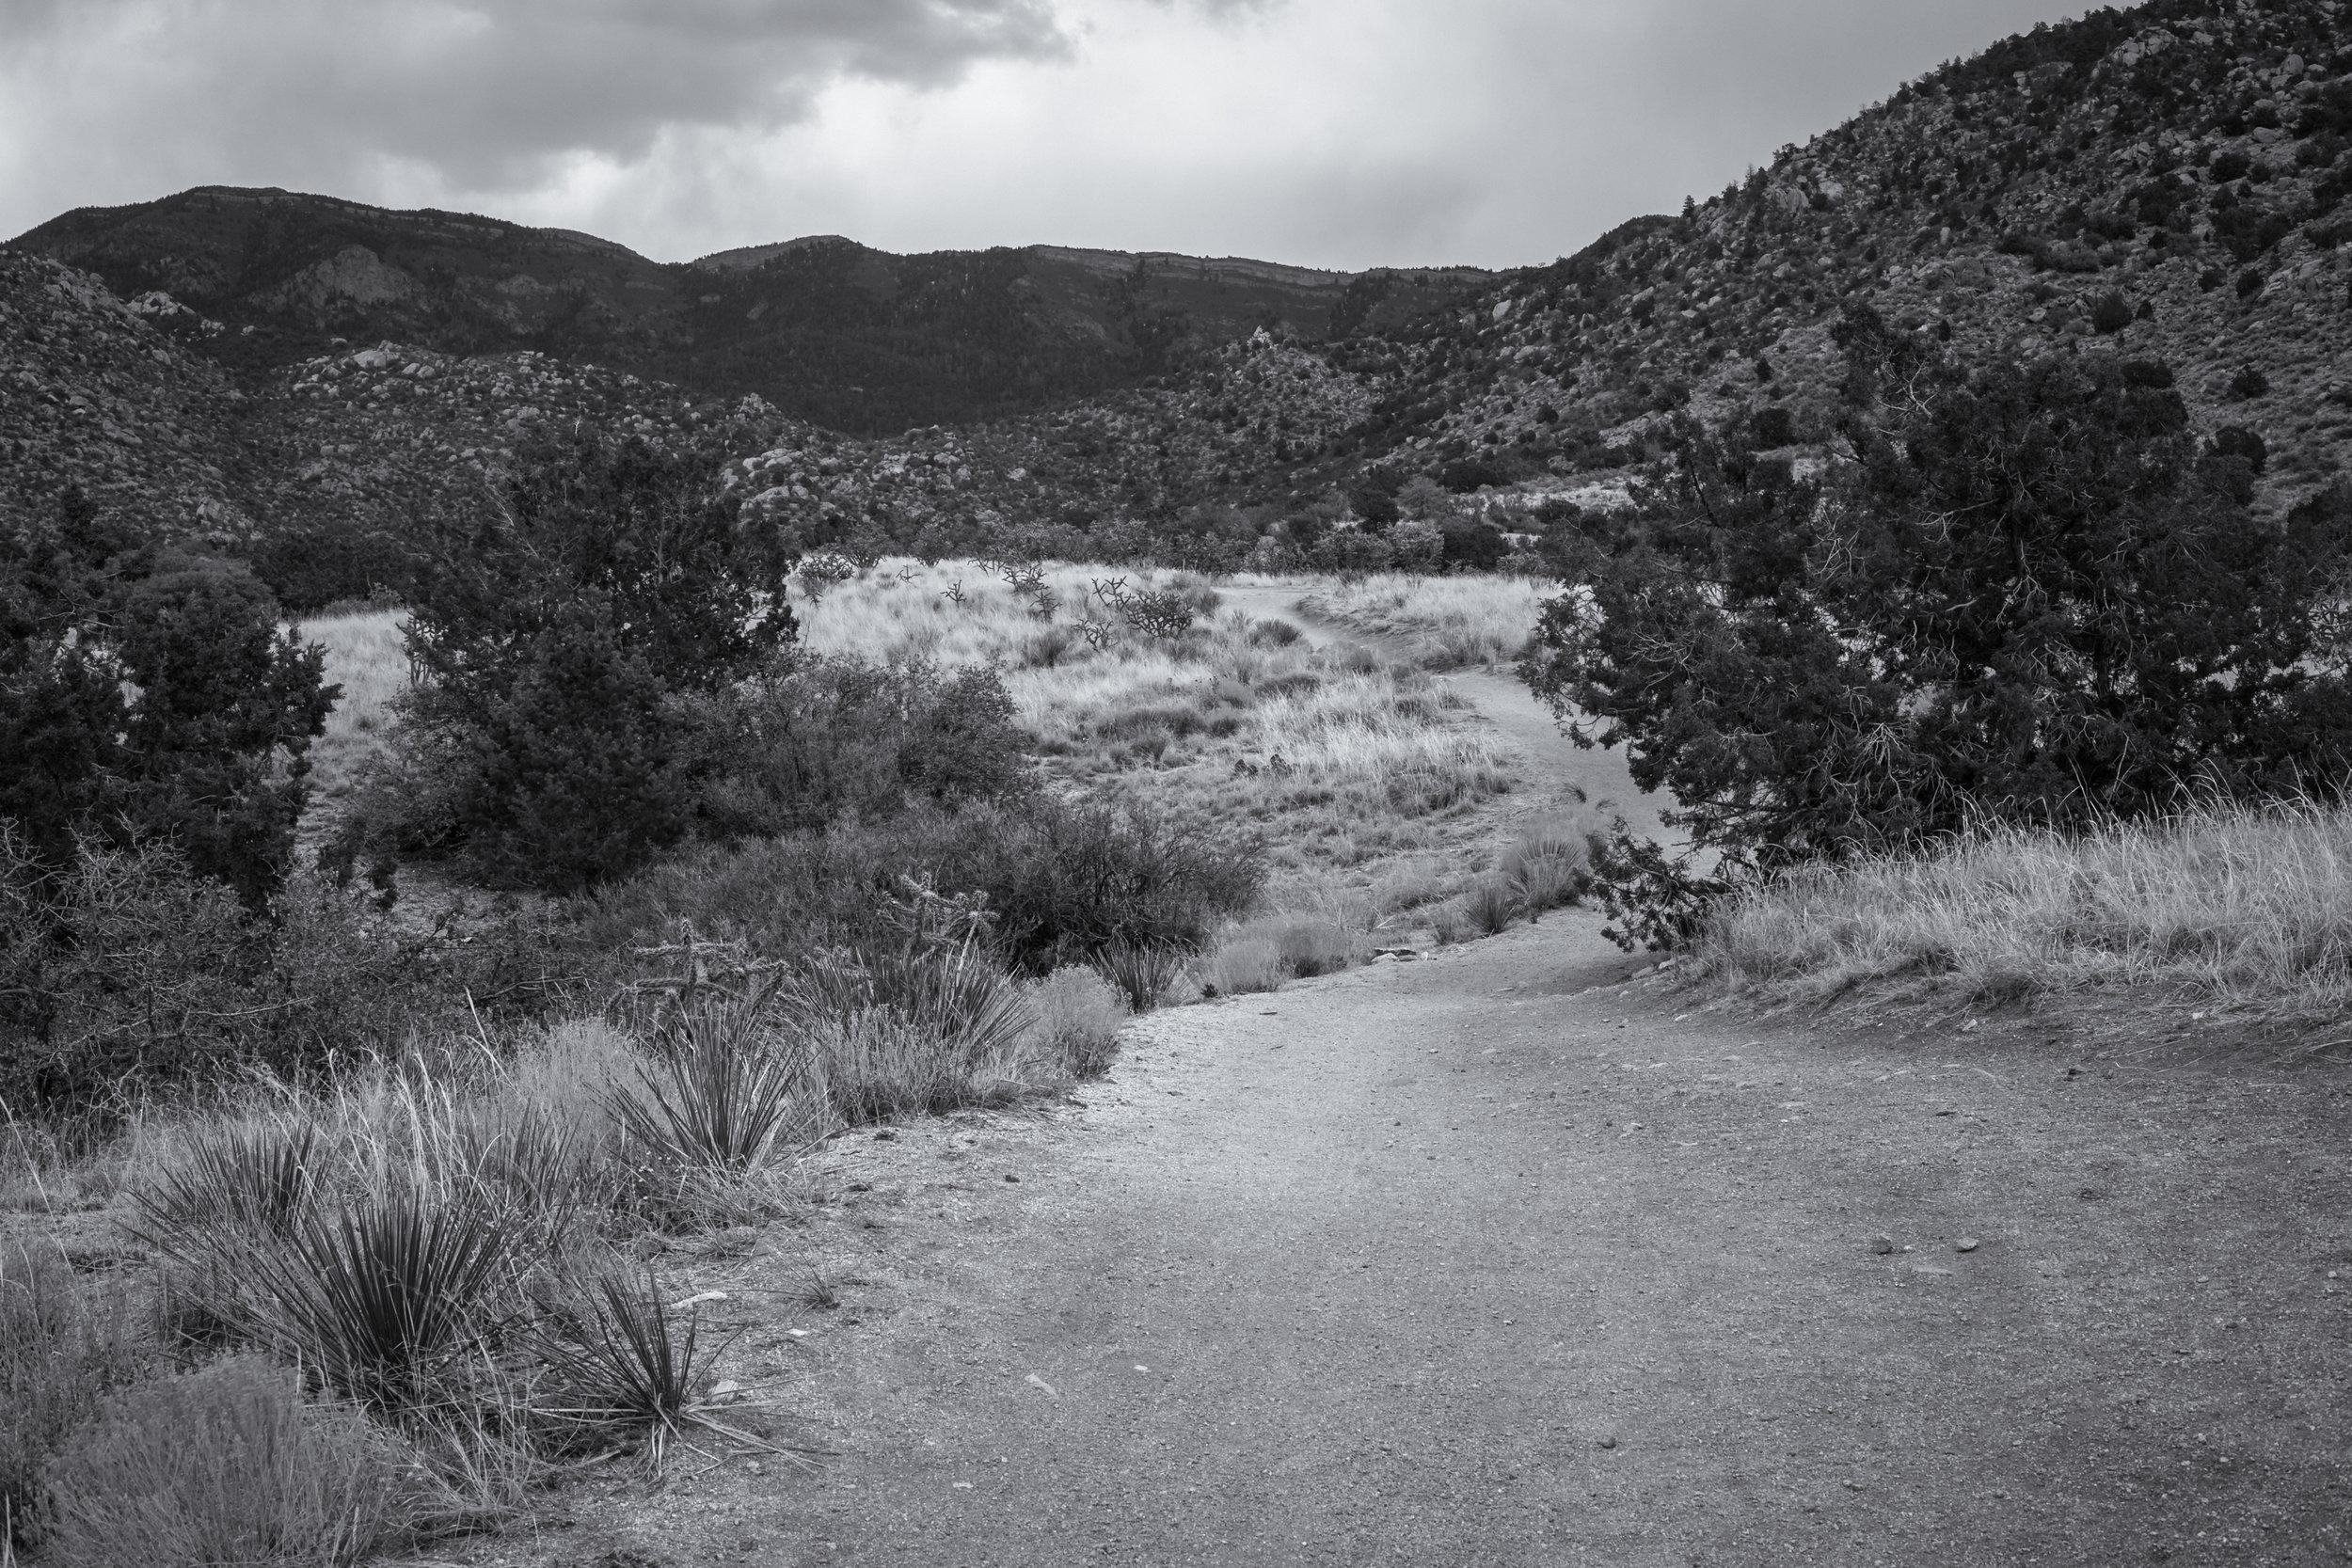 Albuquerque1.0-3.jpg